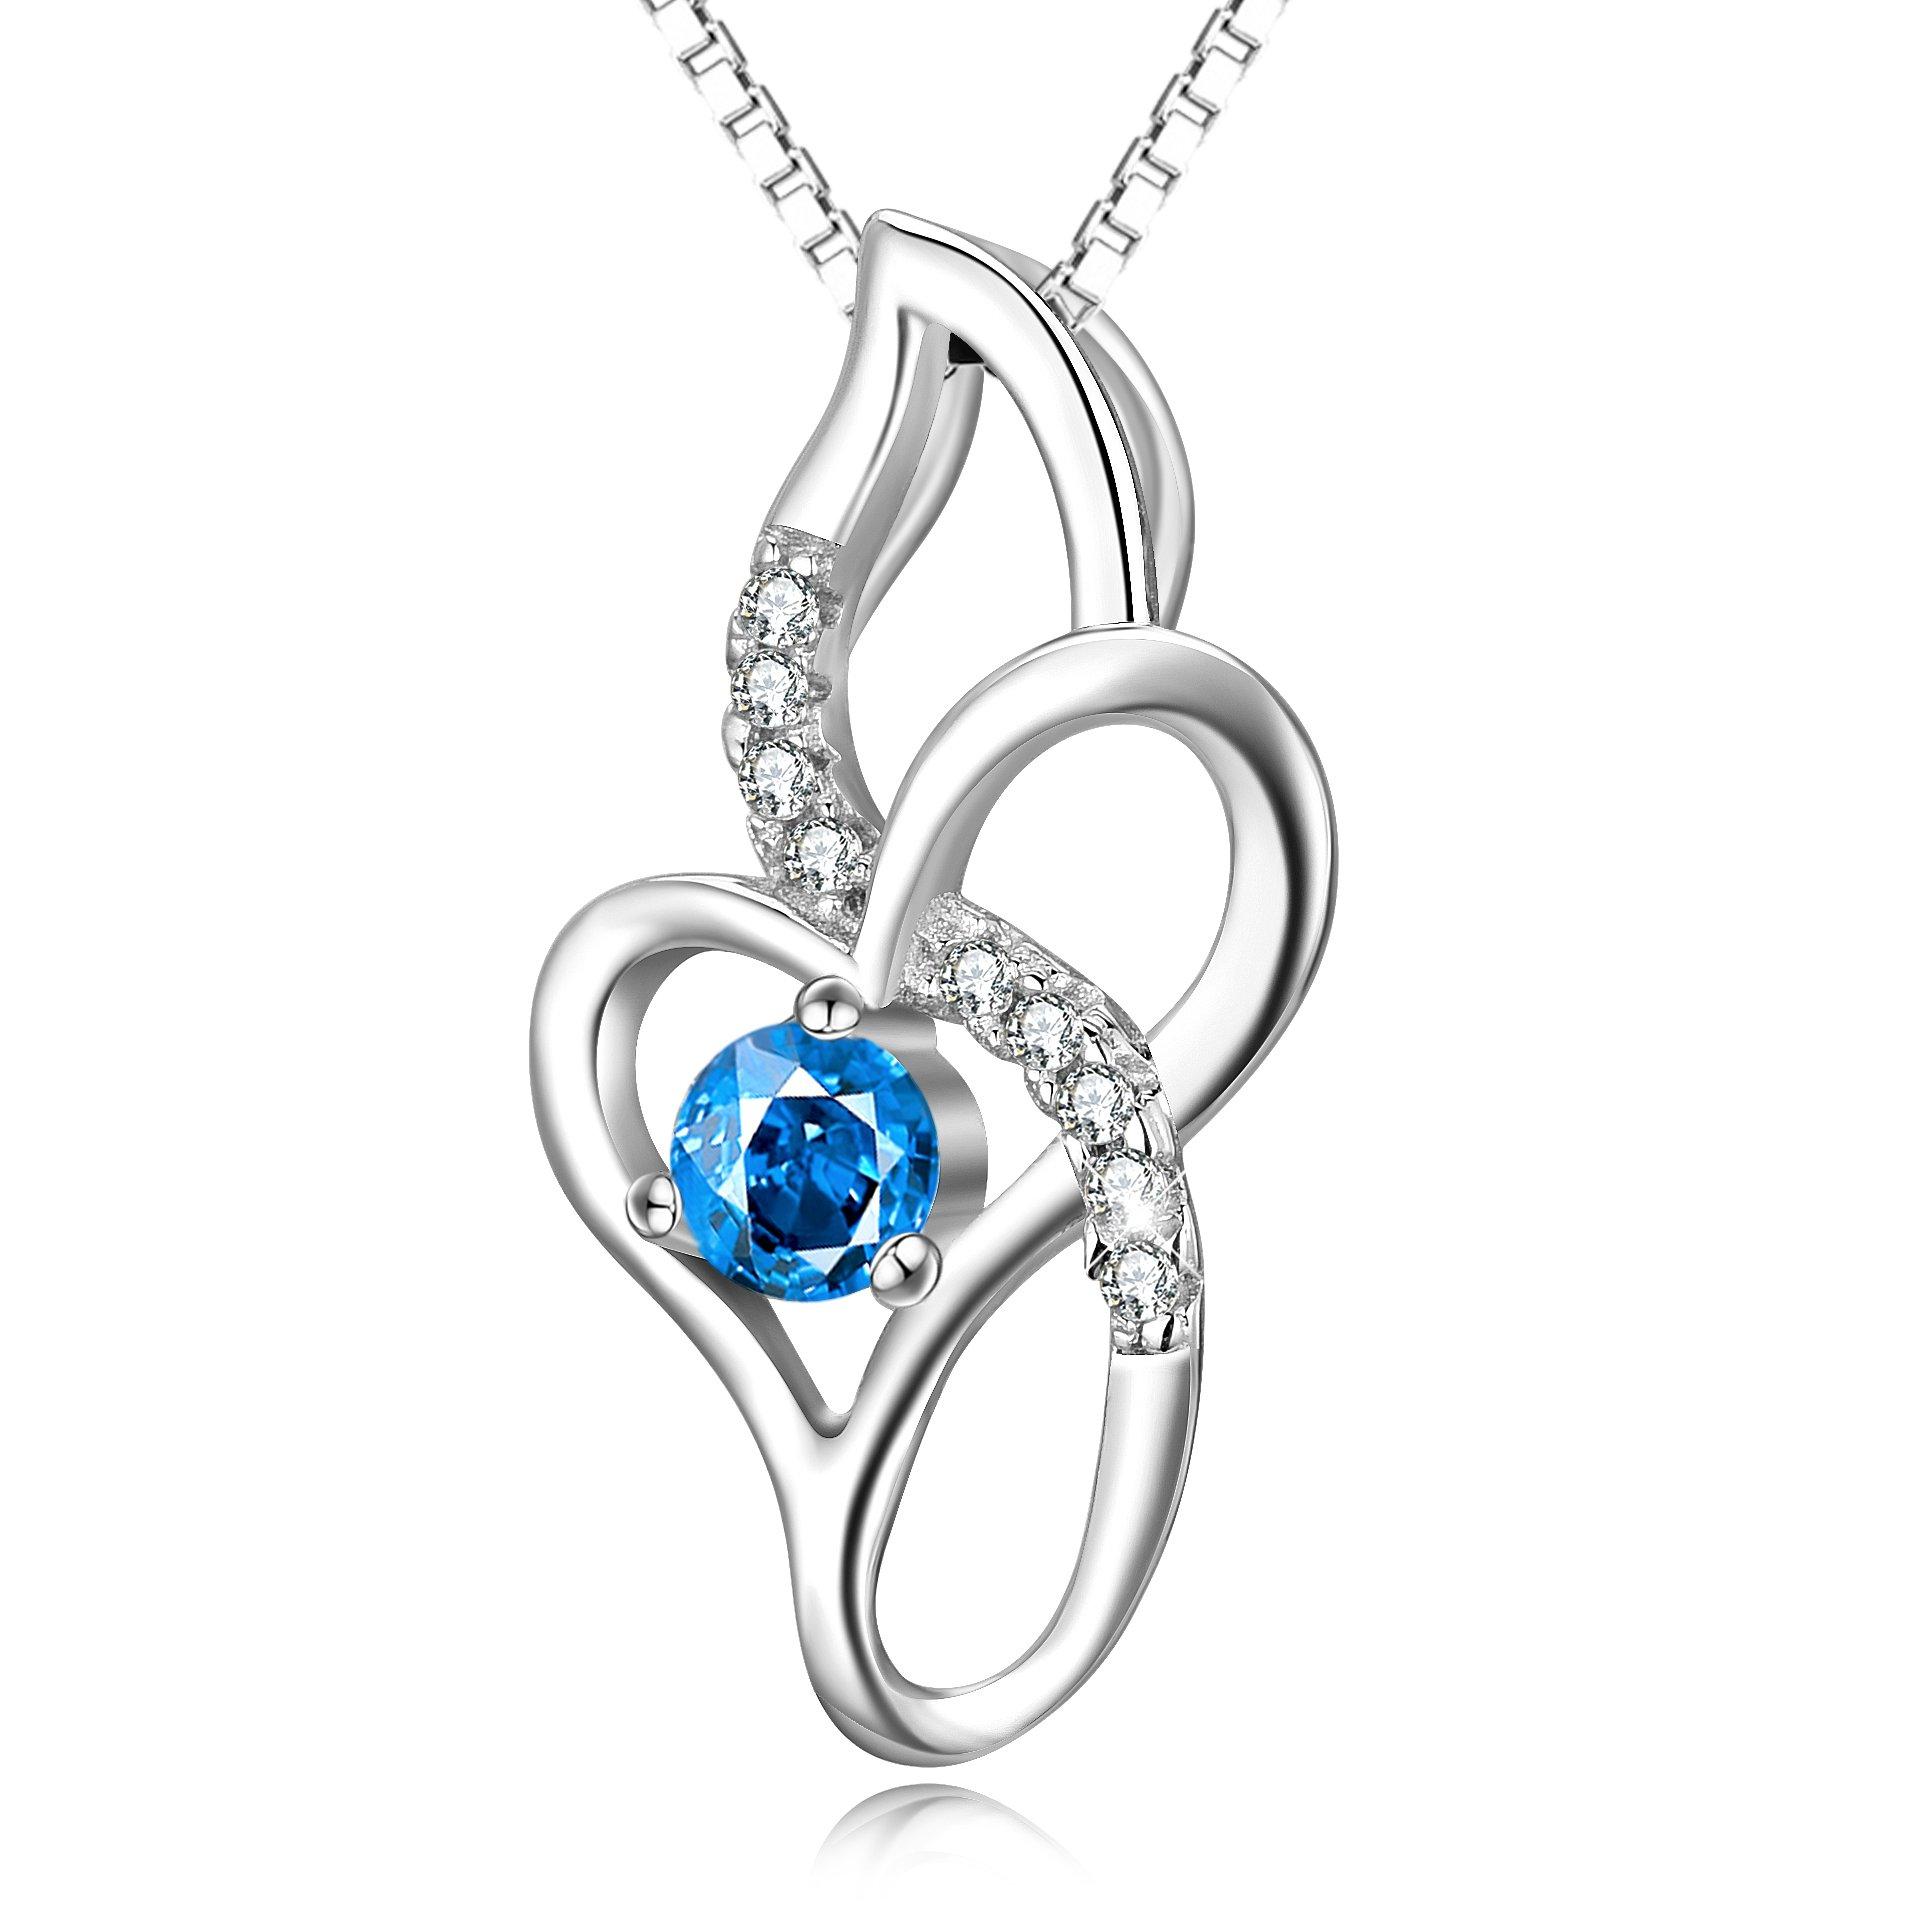 Infinity Love Heart Necklace Sterling Silver Cubic Zircon Jewelry for Women Girls